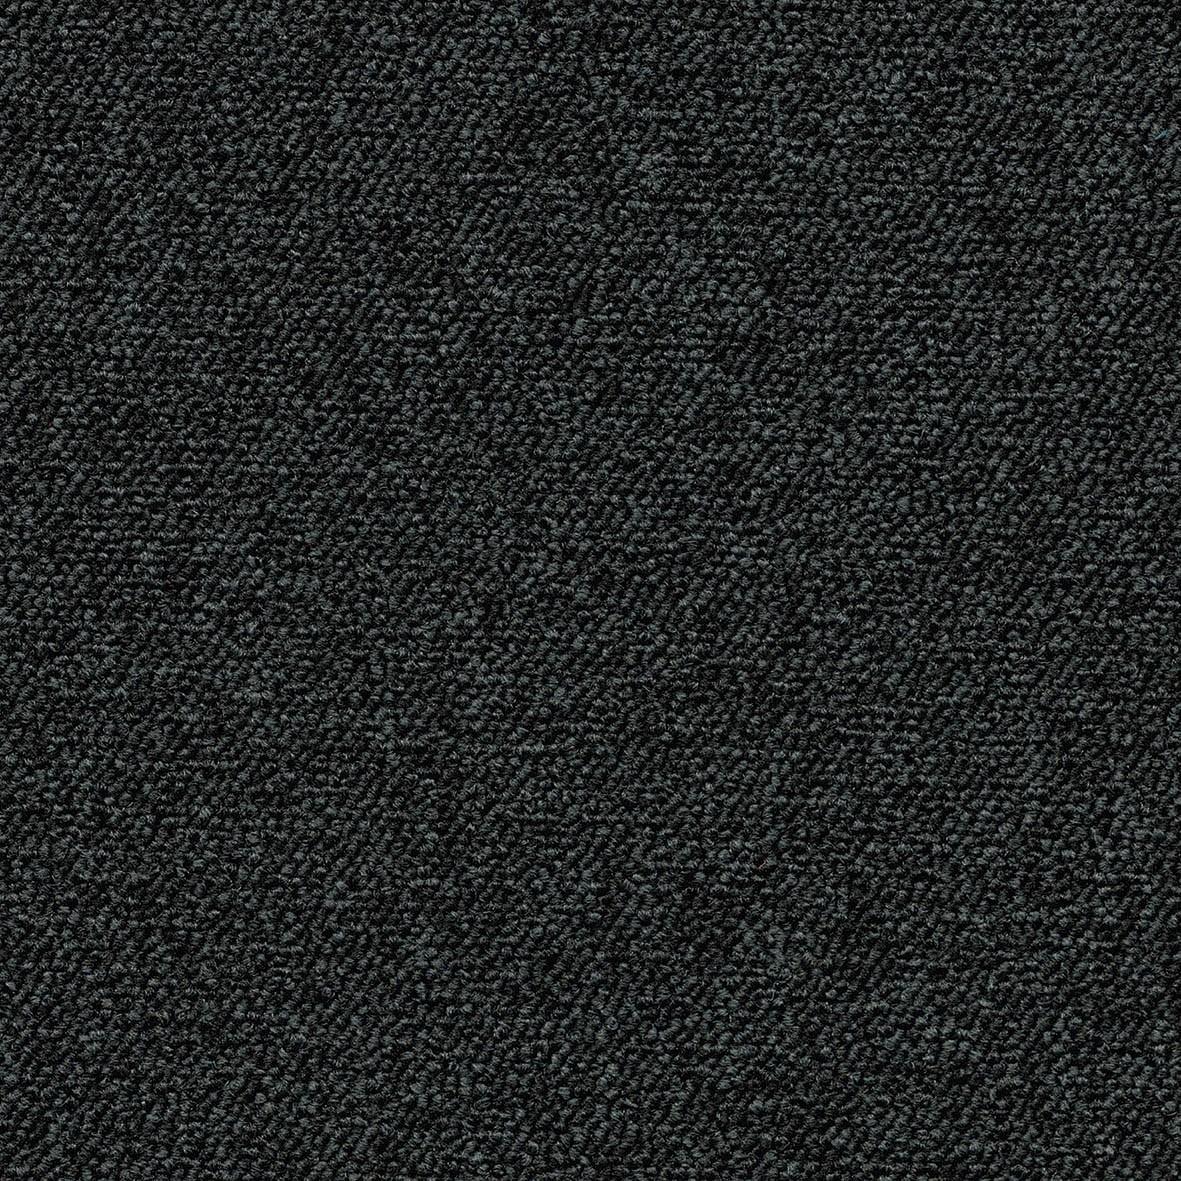 1800 Ebonite